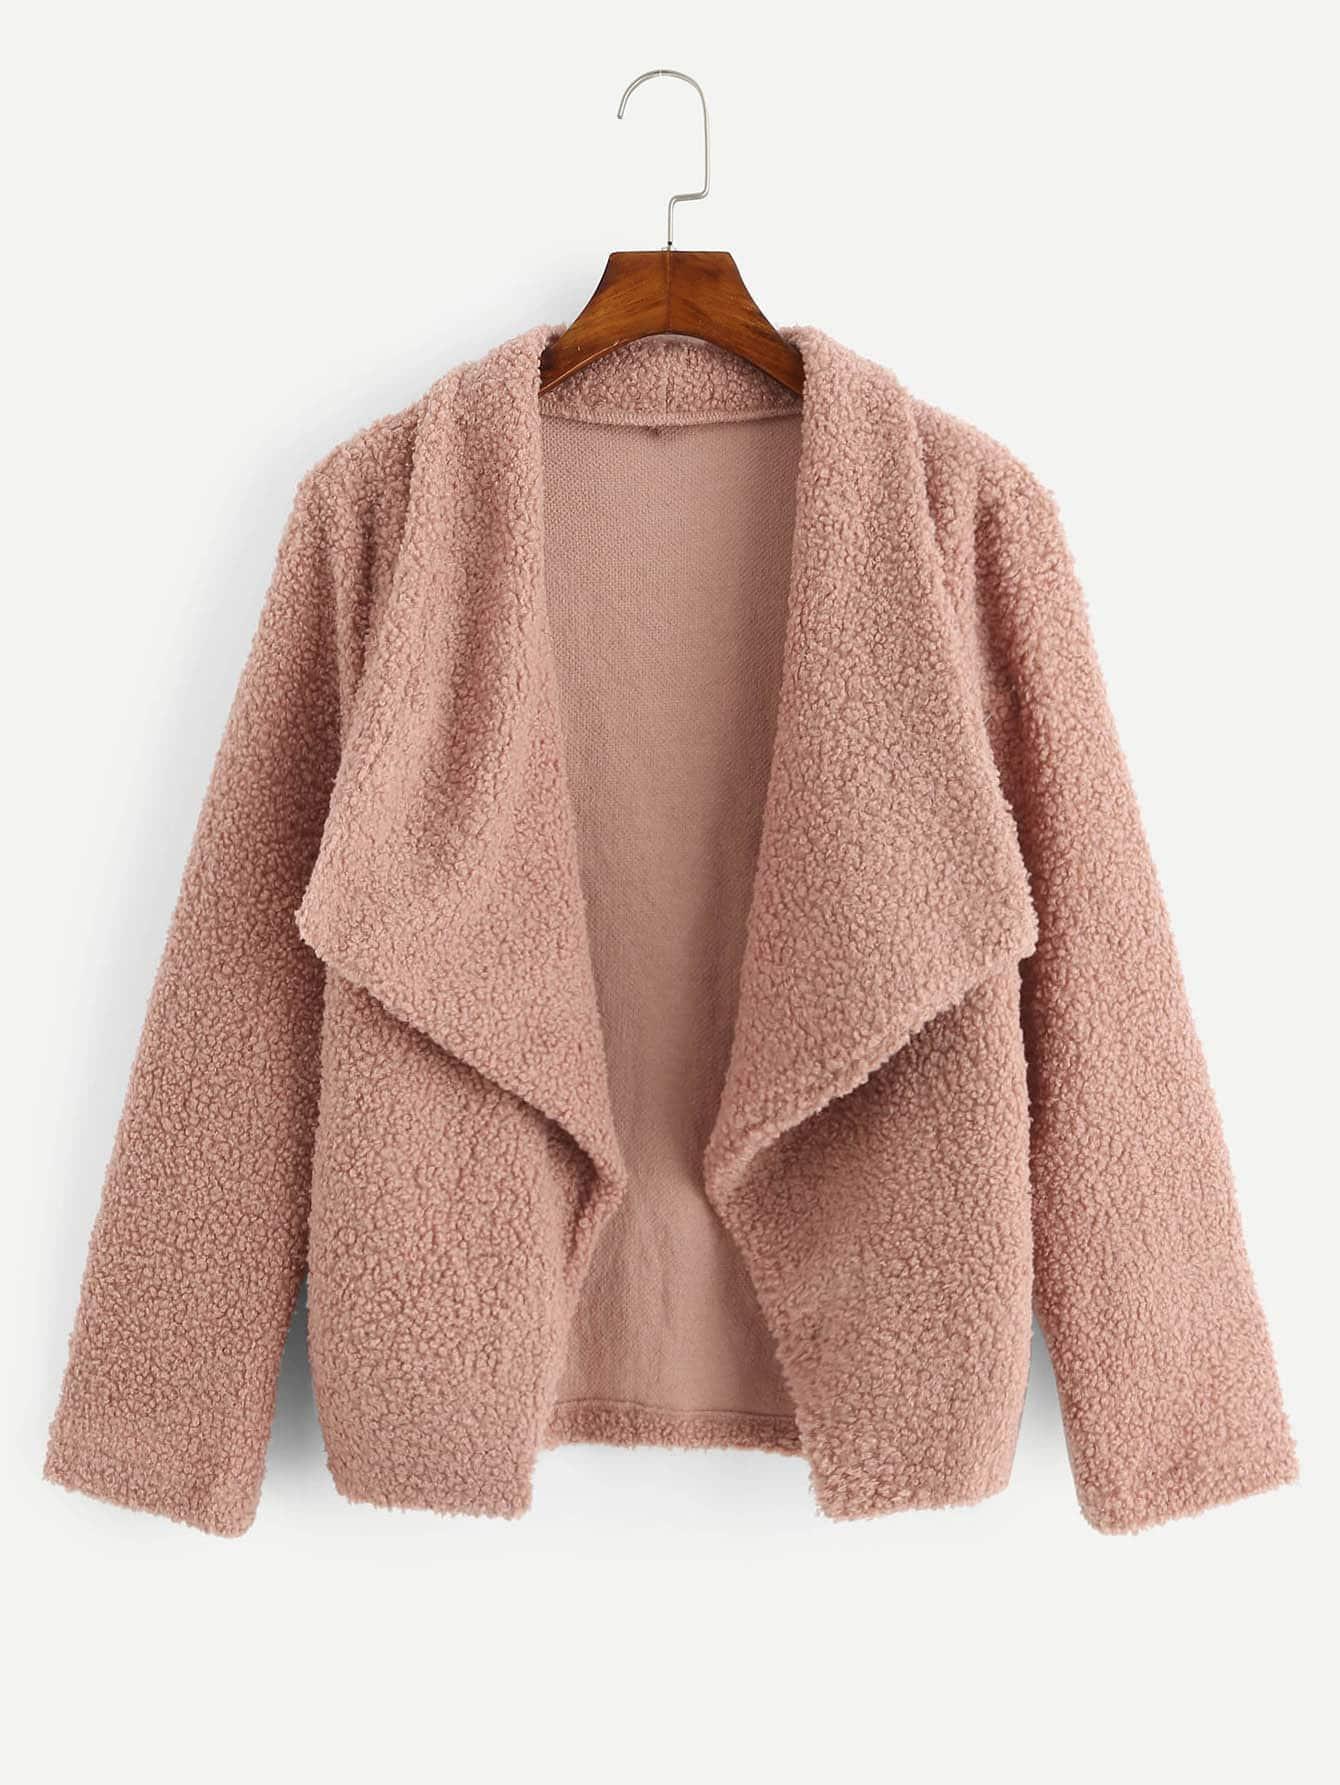 Купить Однотонное пальто тедди с воротником до плеч, null, SheIn